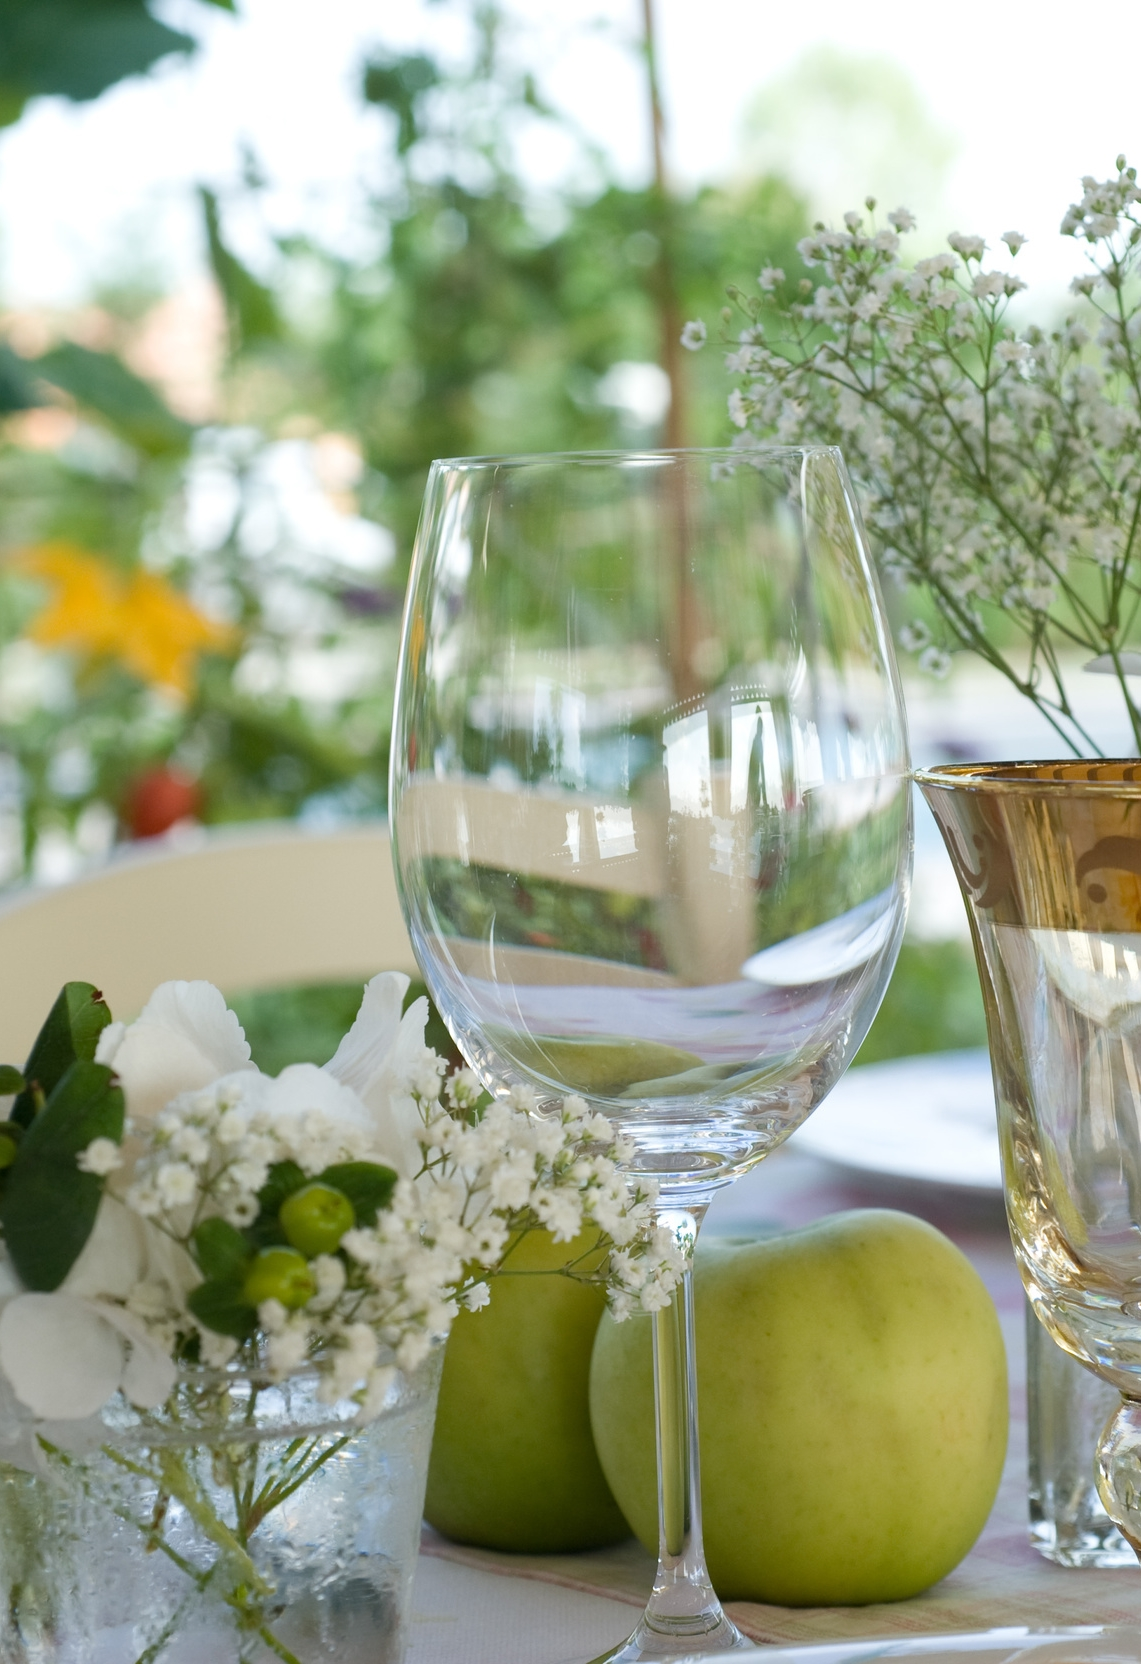 floral-enhanced-inspiring-interior-decor-50575285.jpg